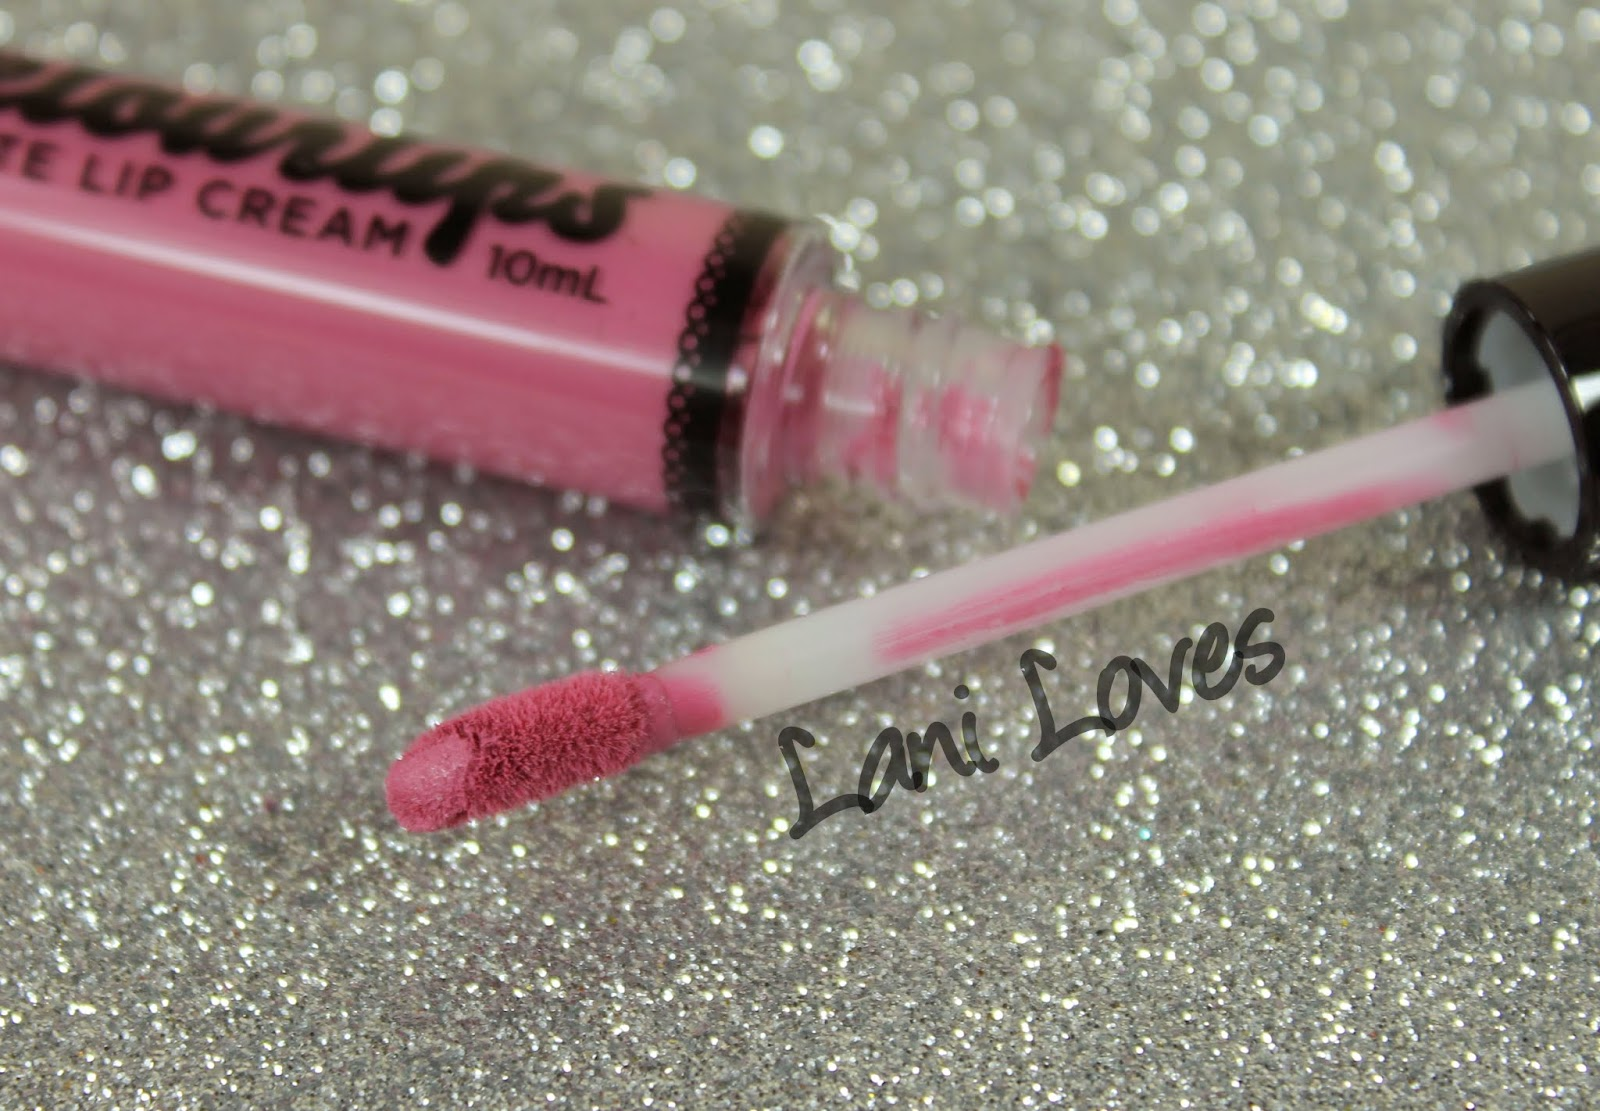 Australis Velourlips Matte Lip Cream - LUN-DUN Swatches & Review